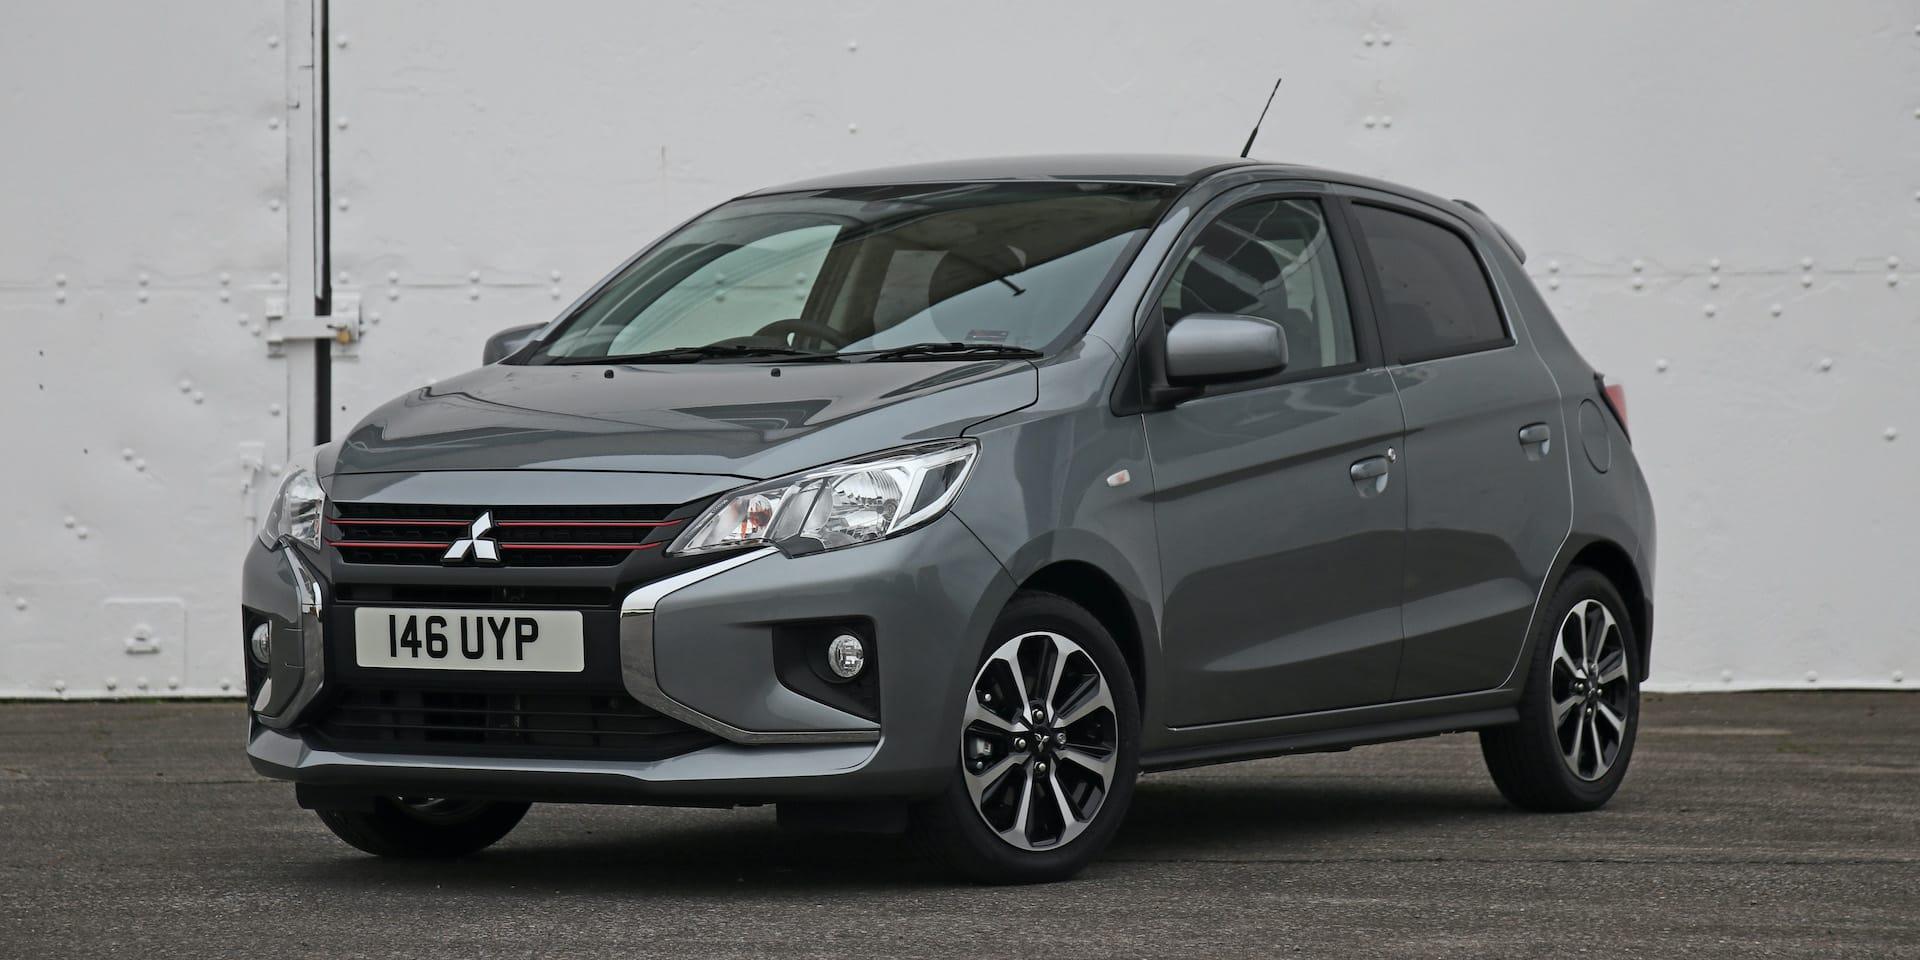 Mitsubishi Mirage (2020 facelift) – Expert Rating